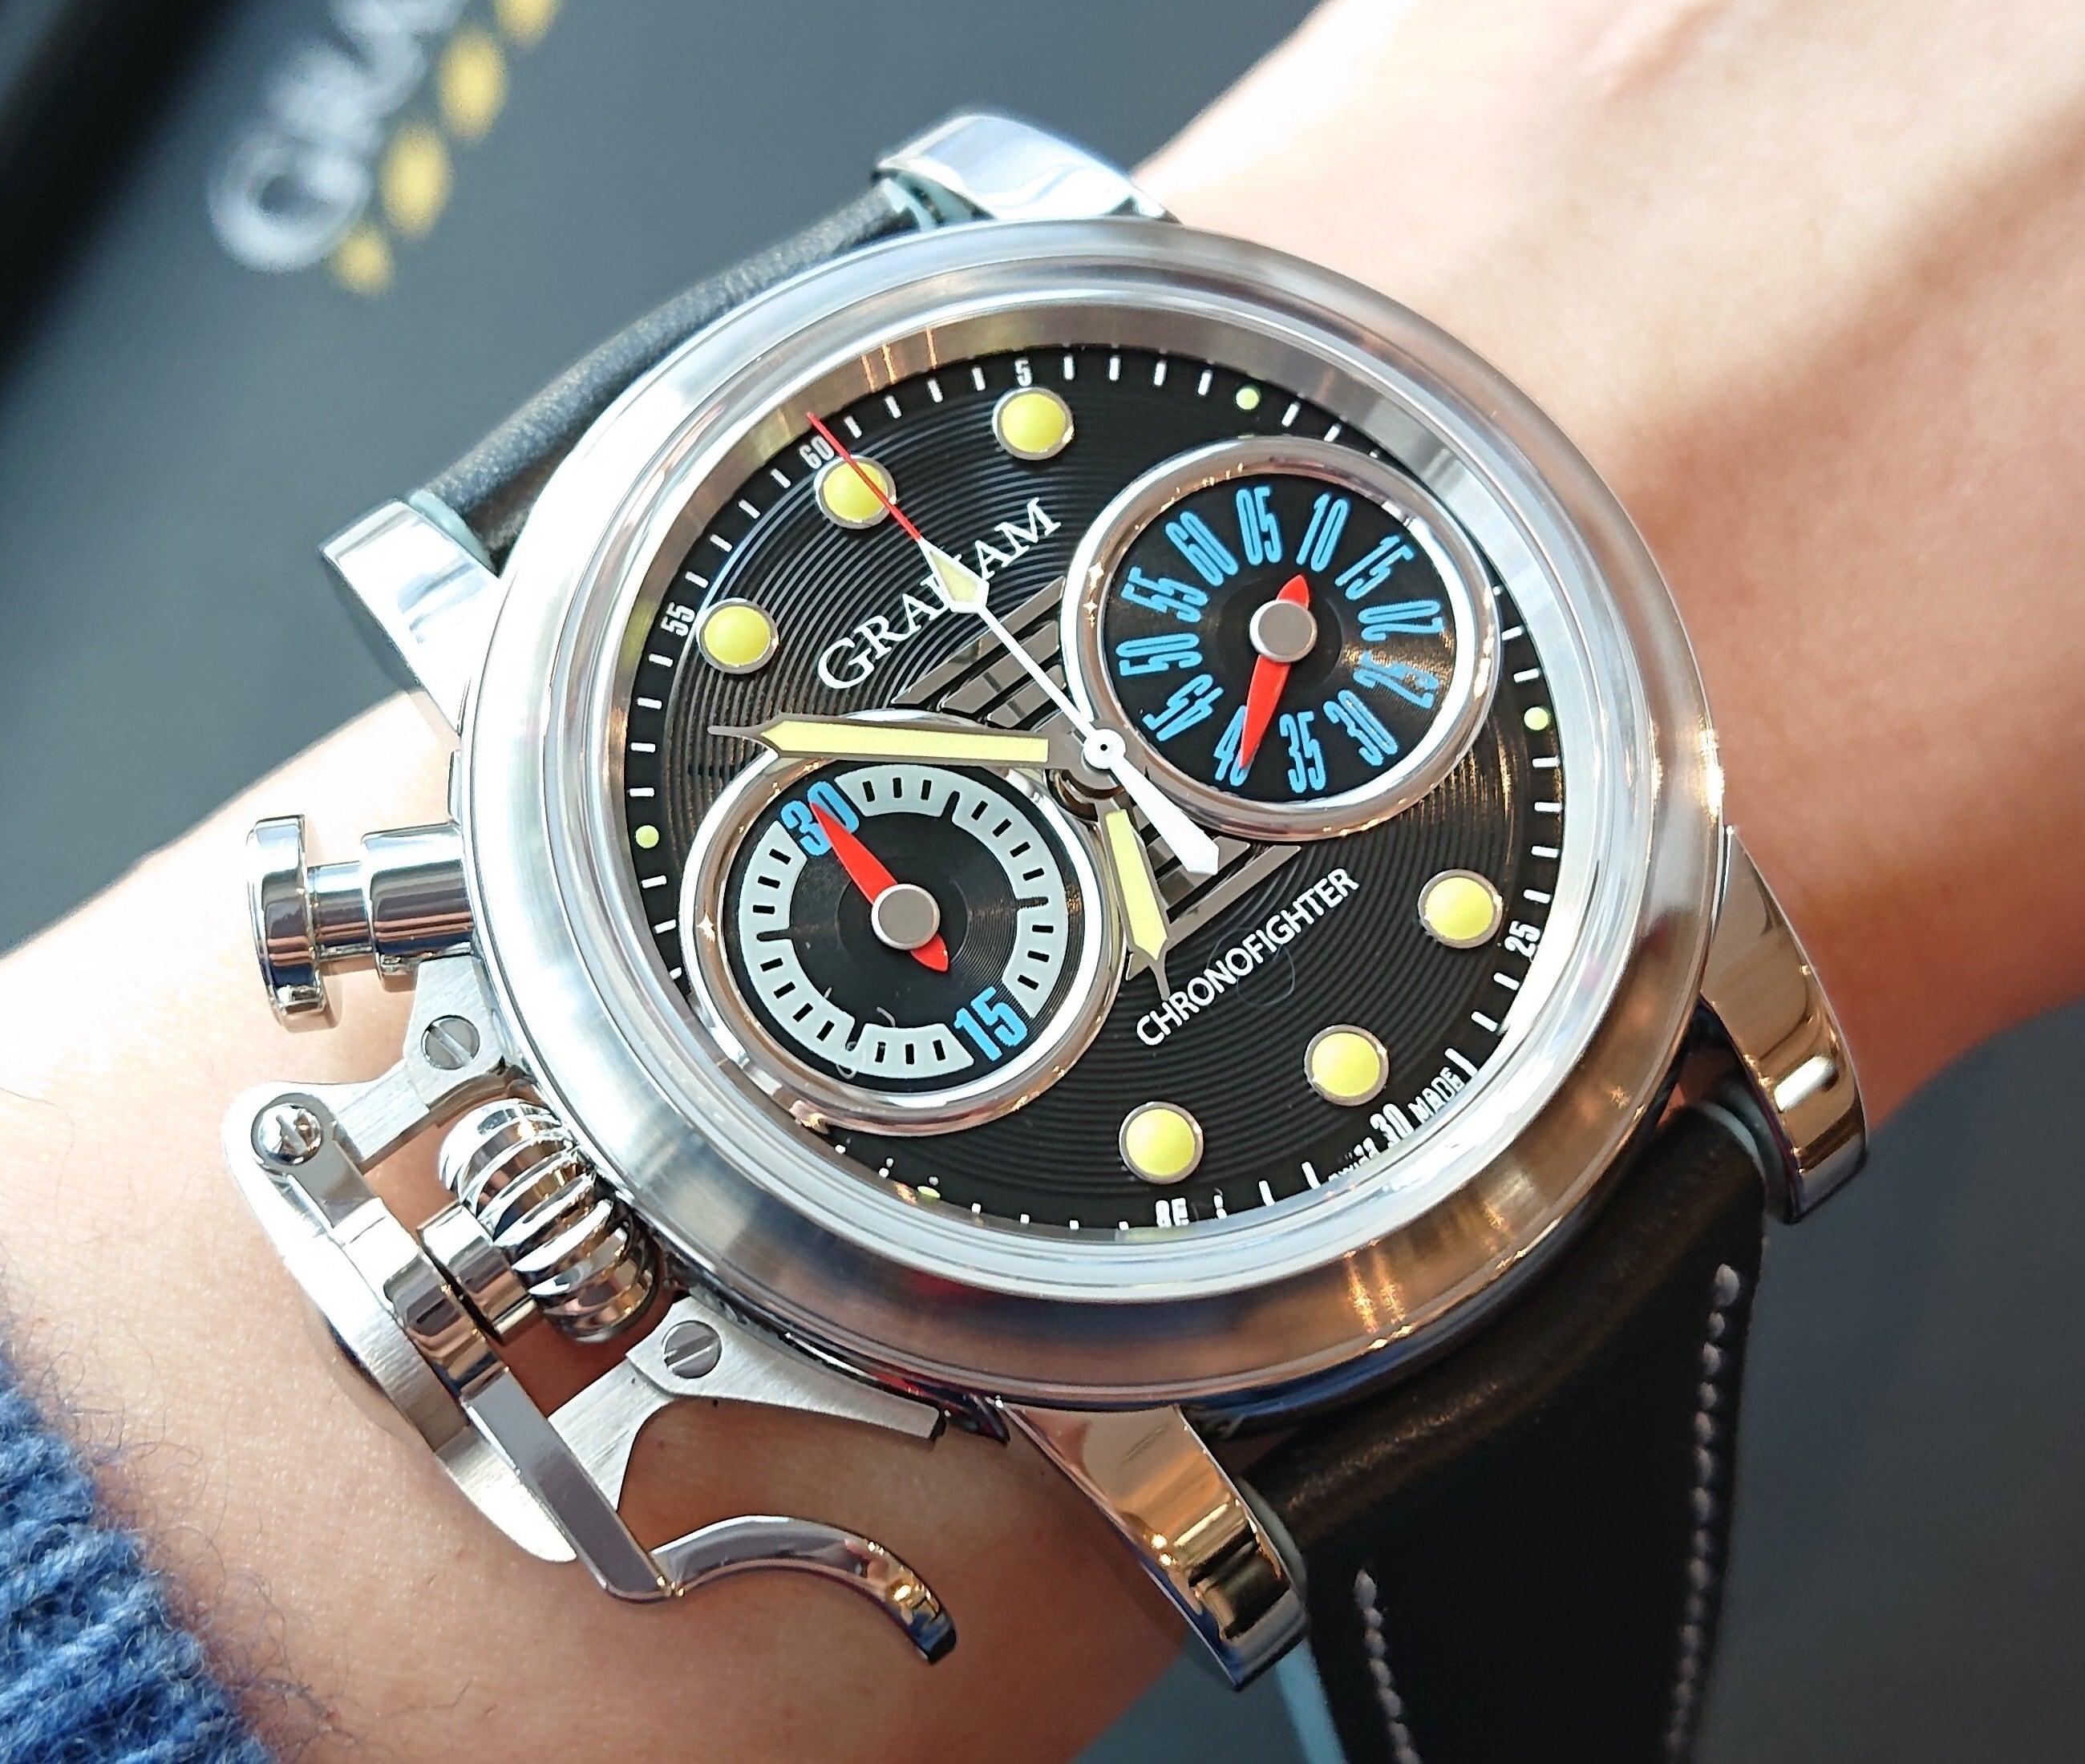 【GRAHAM グラハム】世界限定25本 Chronofighter Vintage Stingray クロノファイターヴィンテージ スティングレイ/国内正規品 腕時計